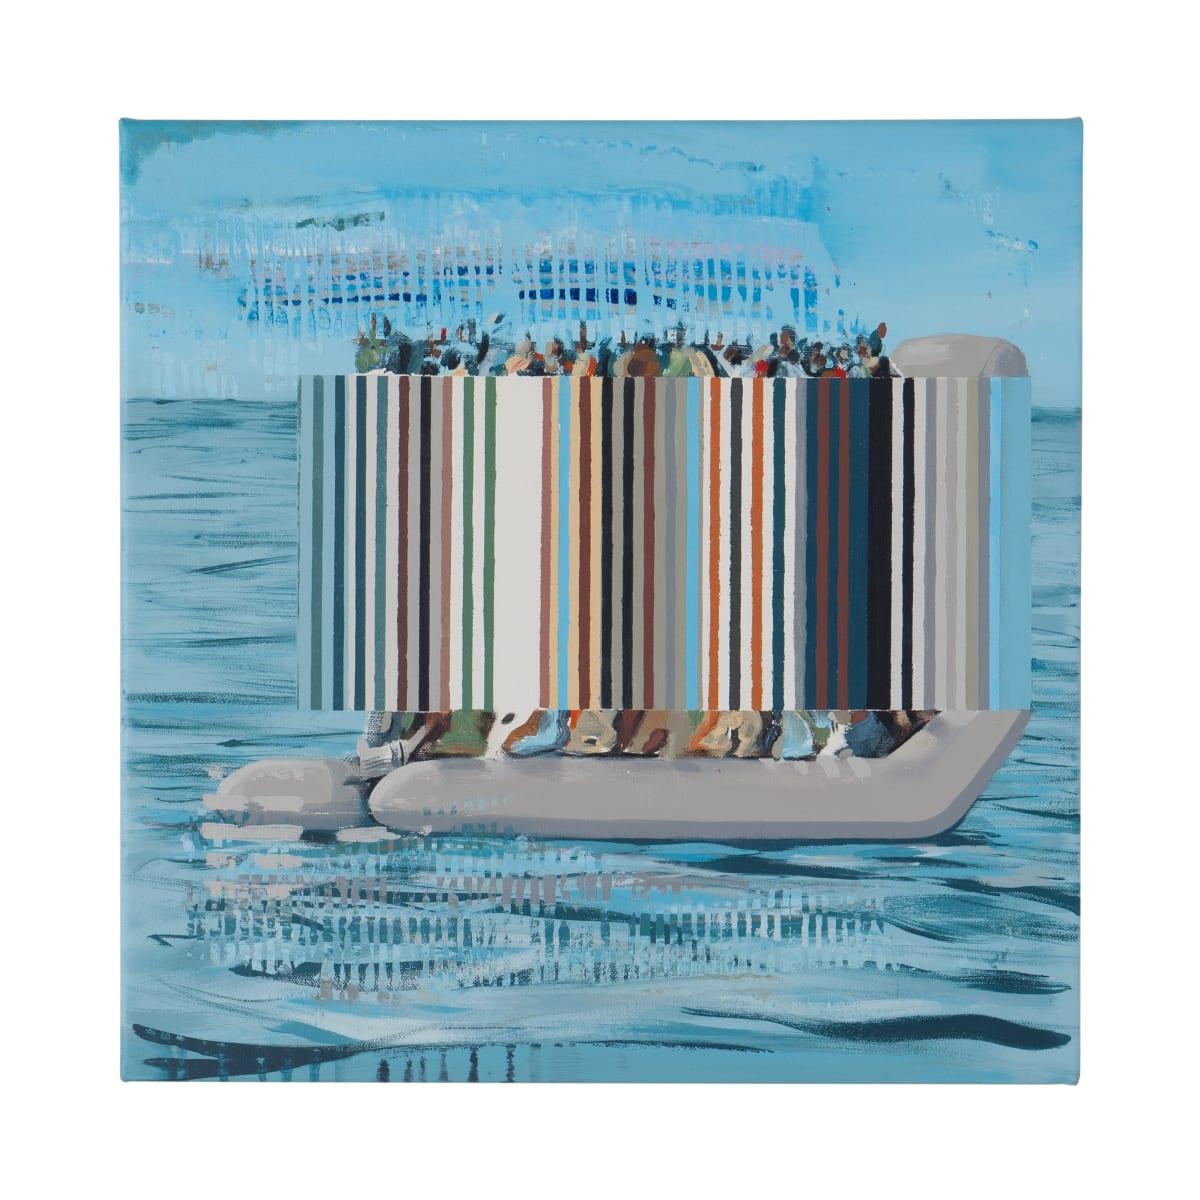 Darren Coffield The Deluge, 2019 Acrylic on canvas 45 x 45 cm